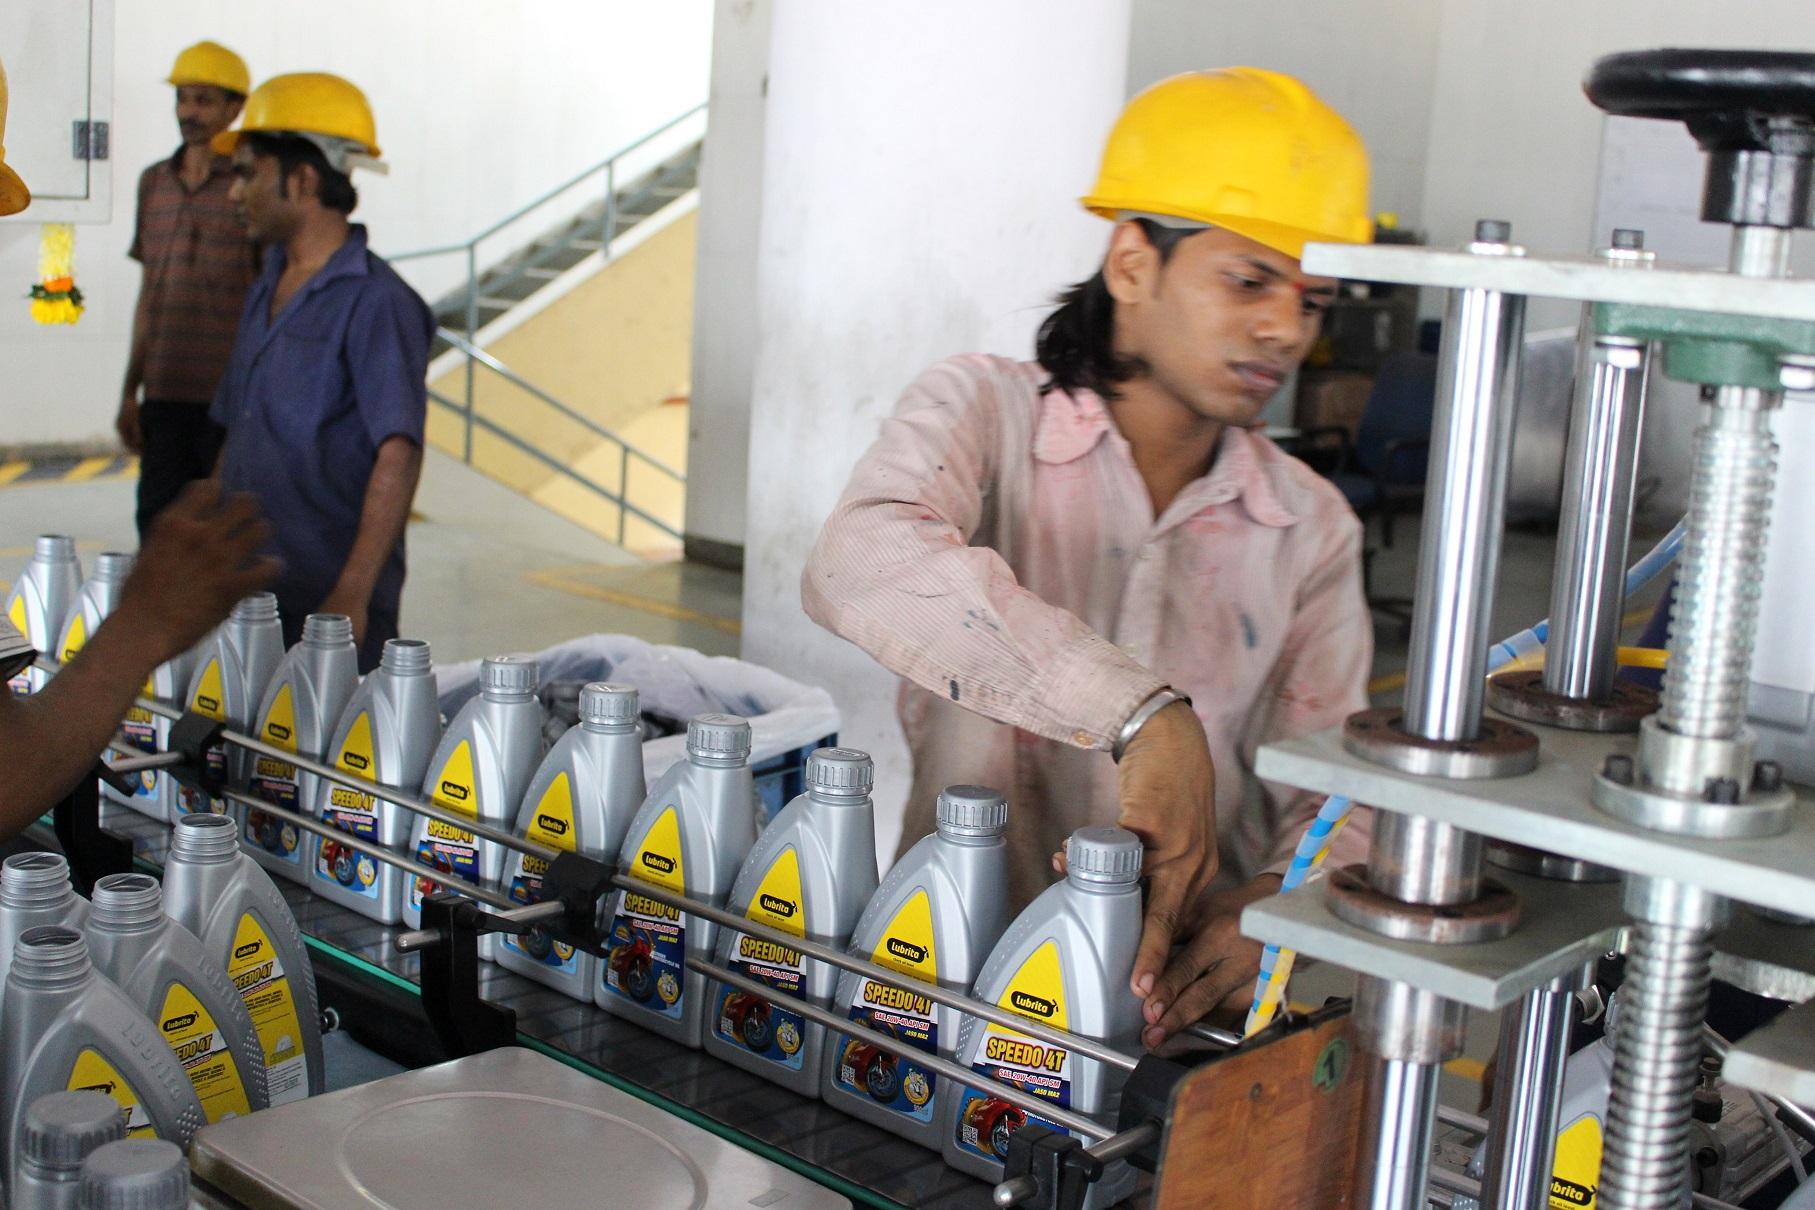 Lubrita started its operation in Indian market! - Lubrita com